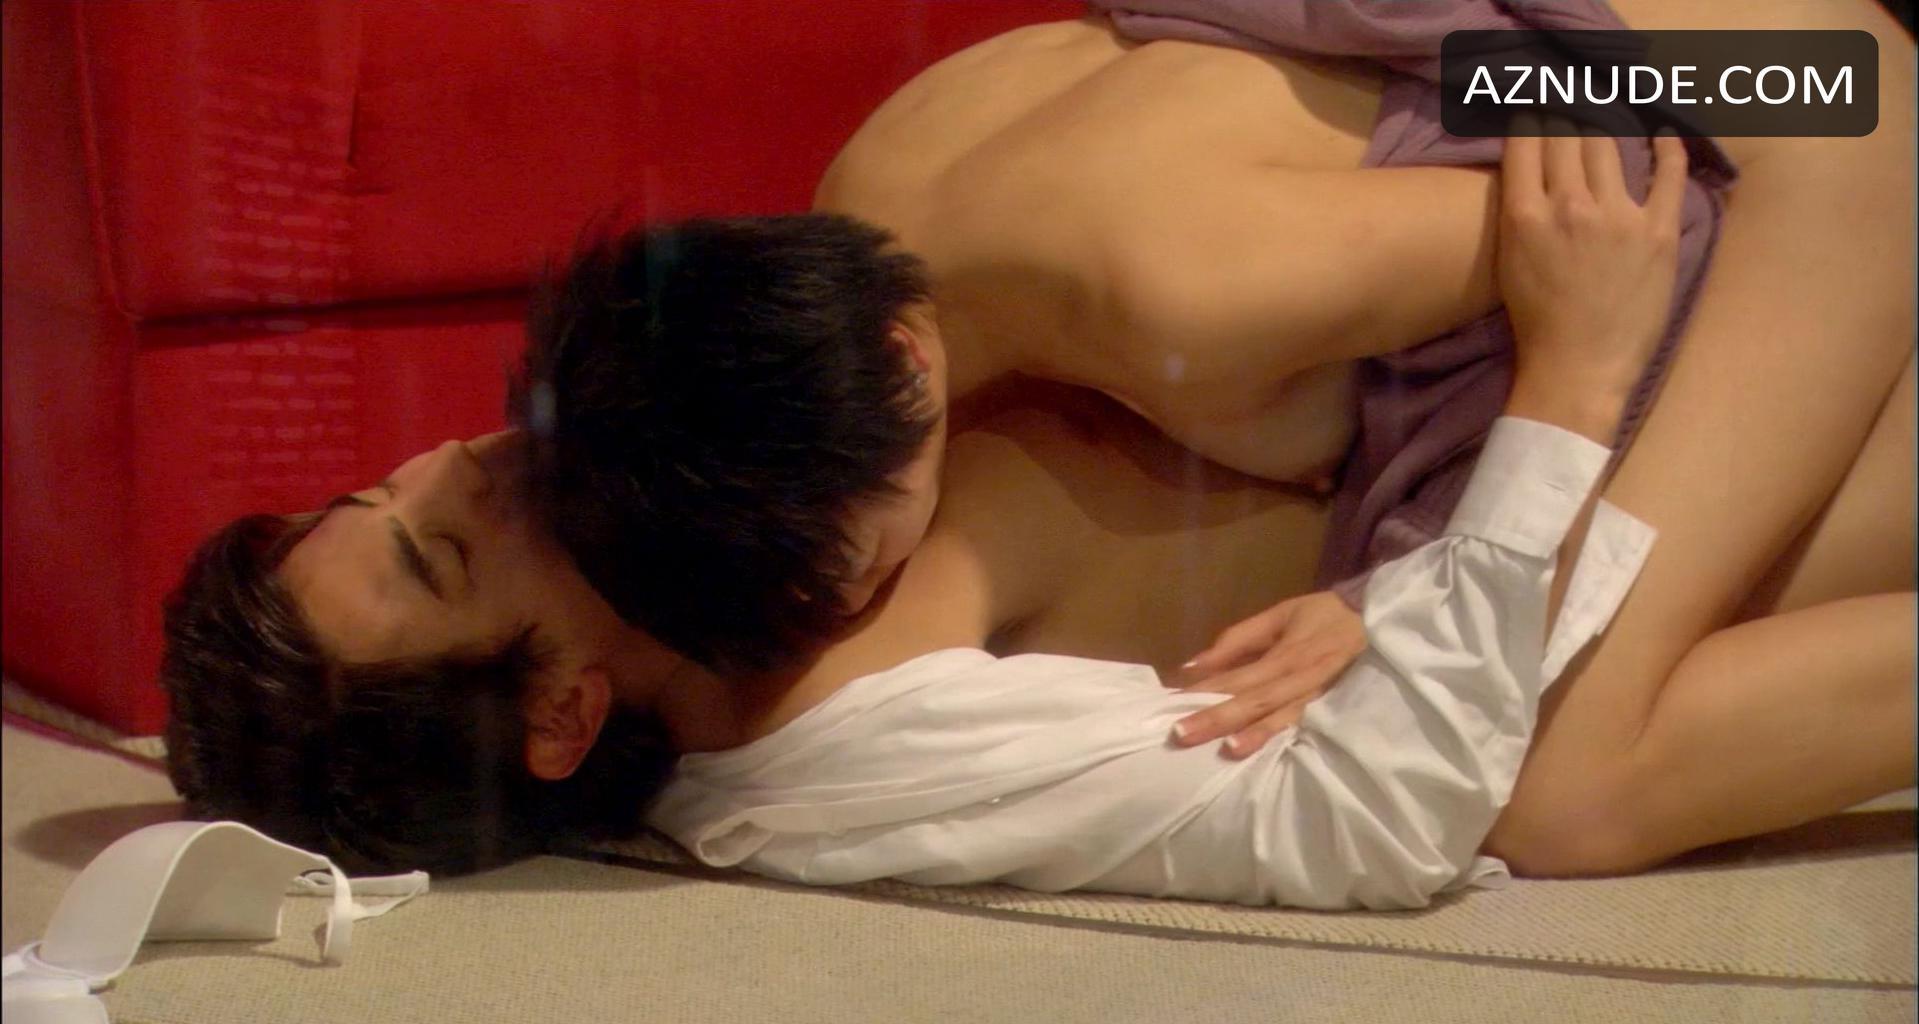 Leung nude winnie